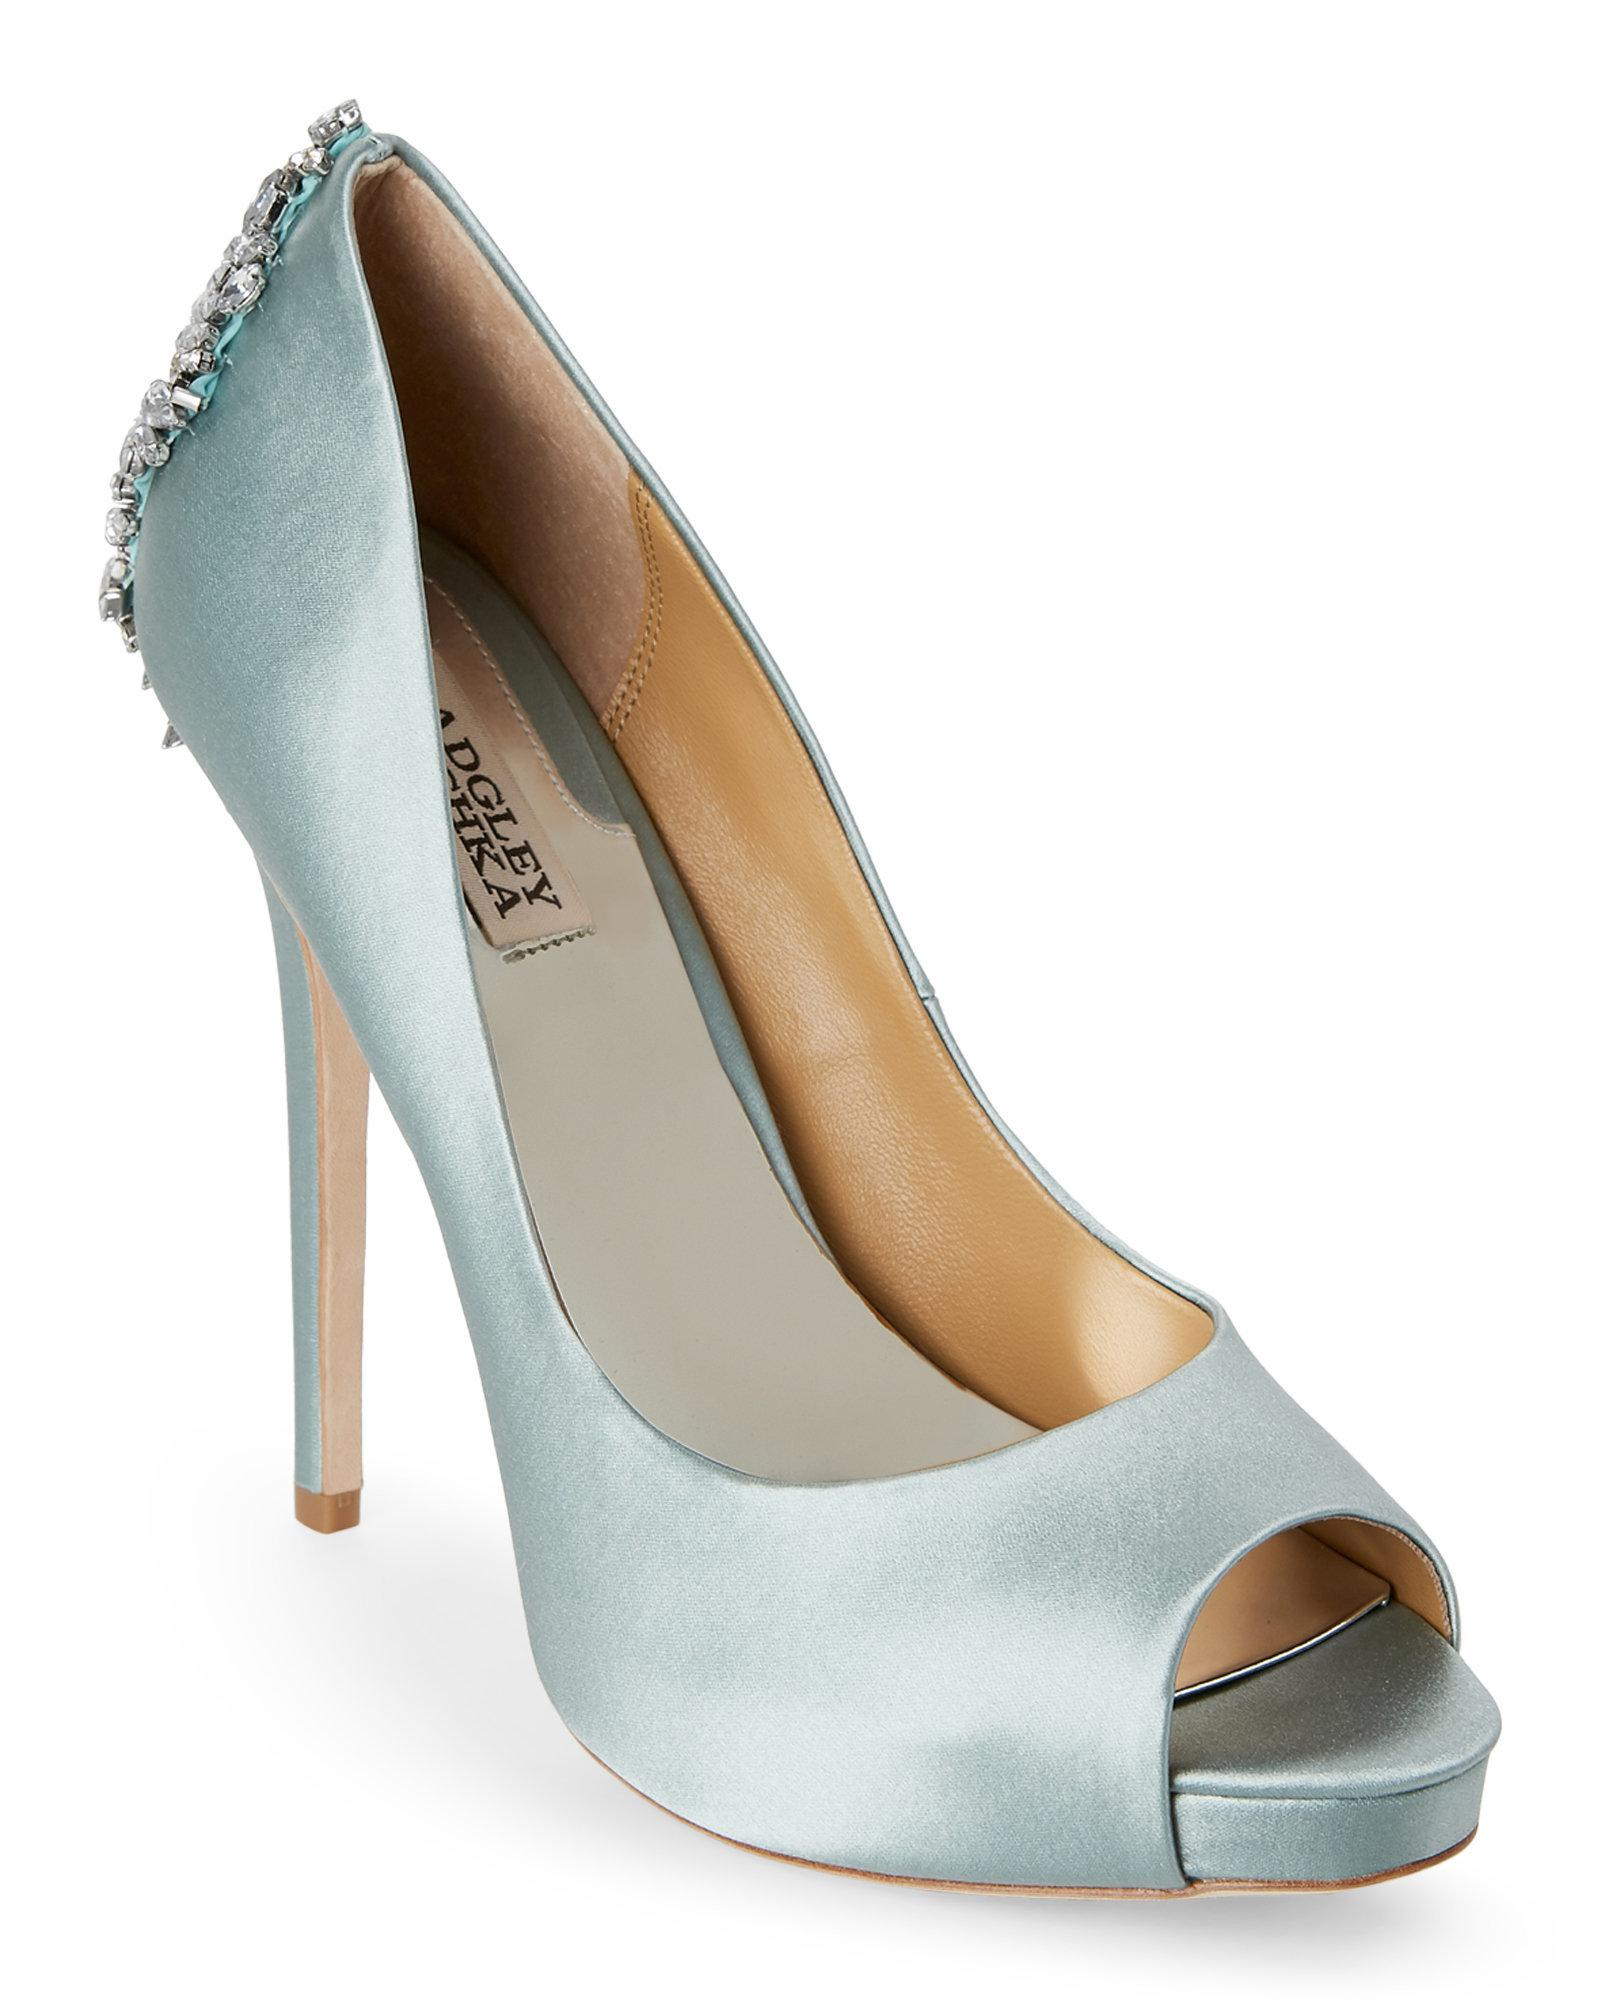 a770d38569a2 Lyst - Badgley Mischka Blue Radiance Kiara Embellished Peep Toe ...